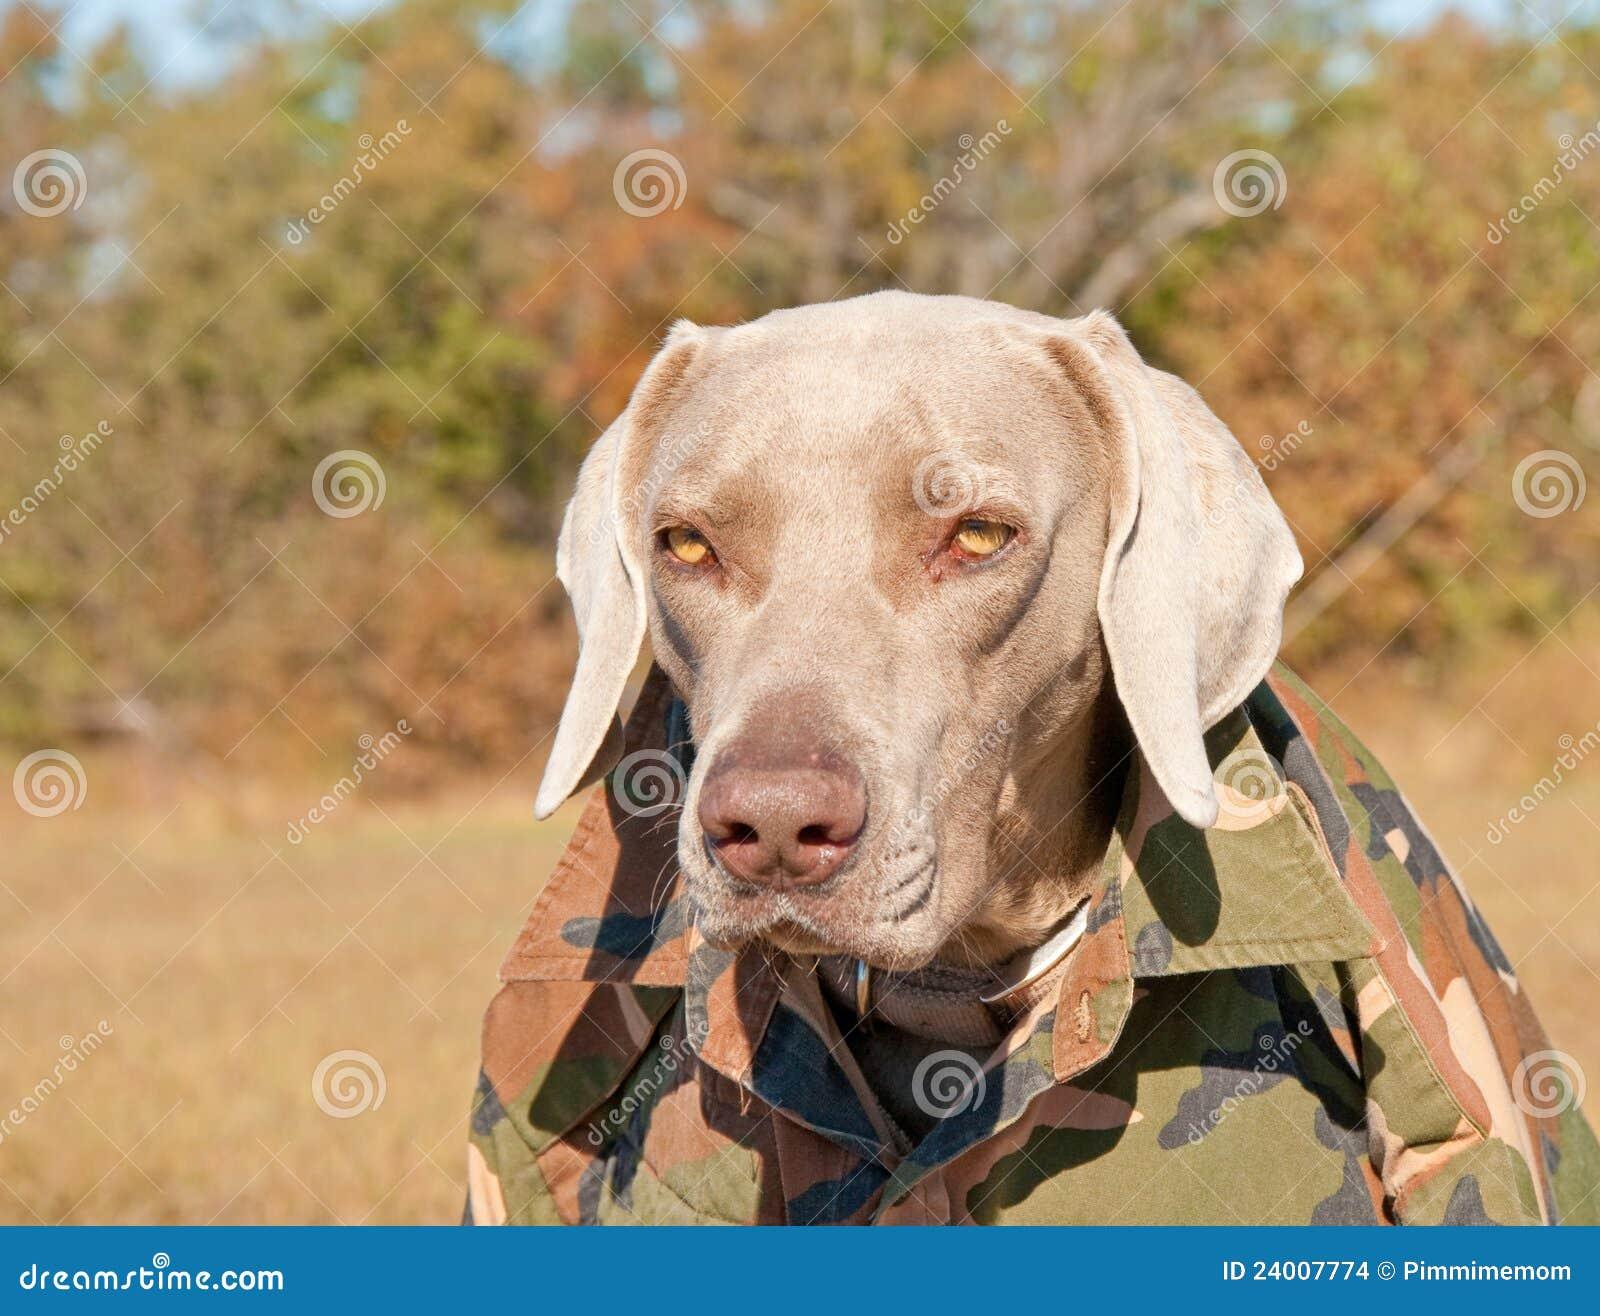 Funny Image Of A Weimaraner Dog Wearing A Camo Shi Stock